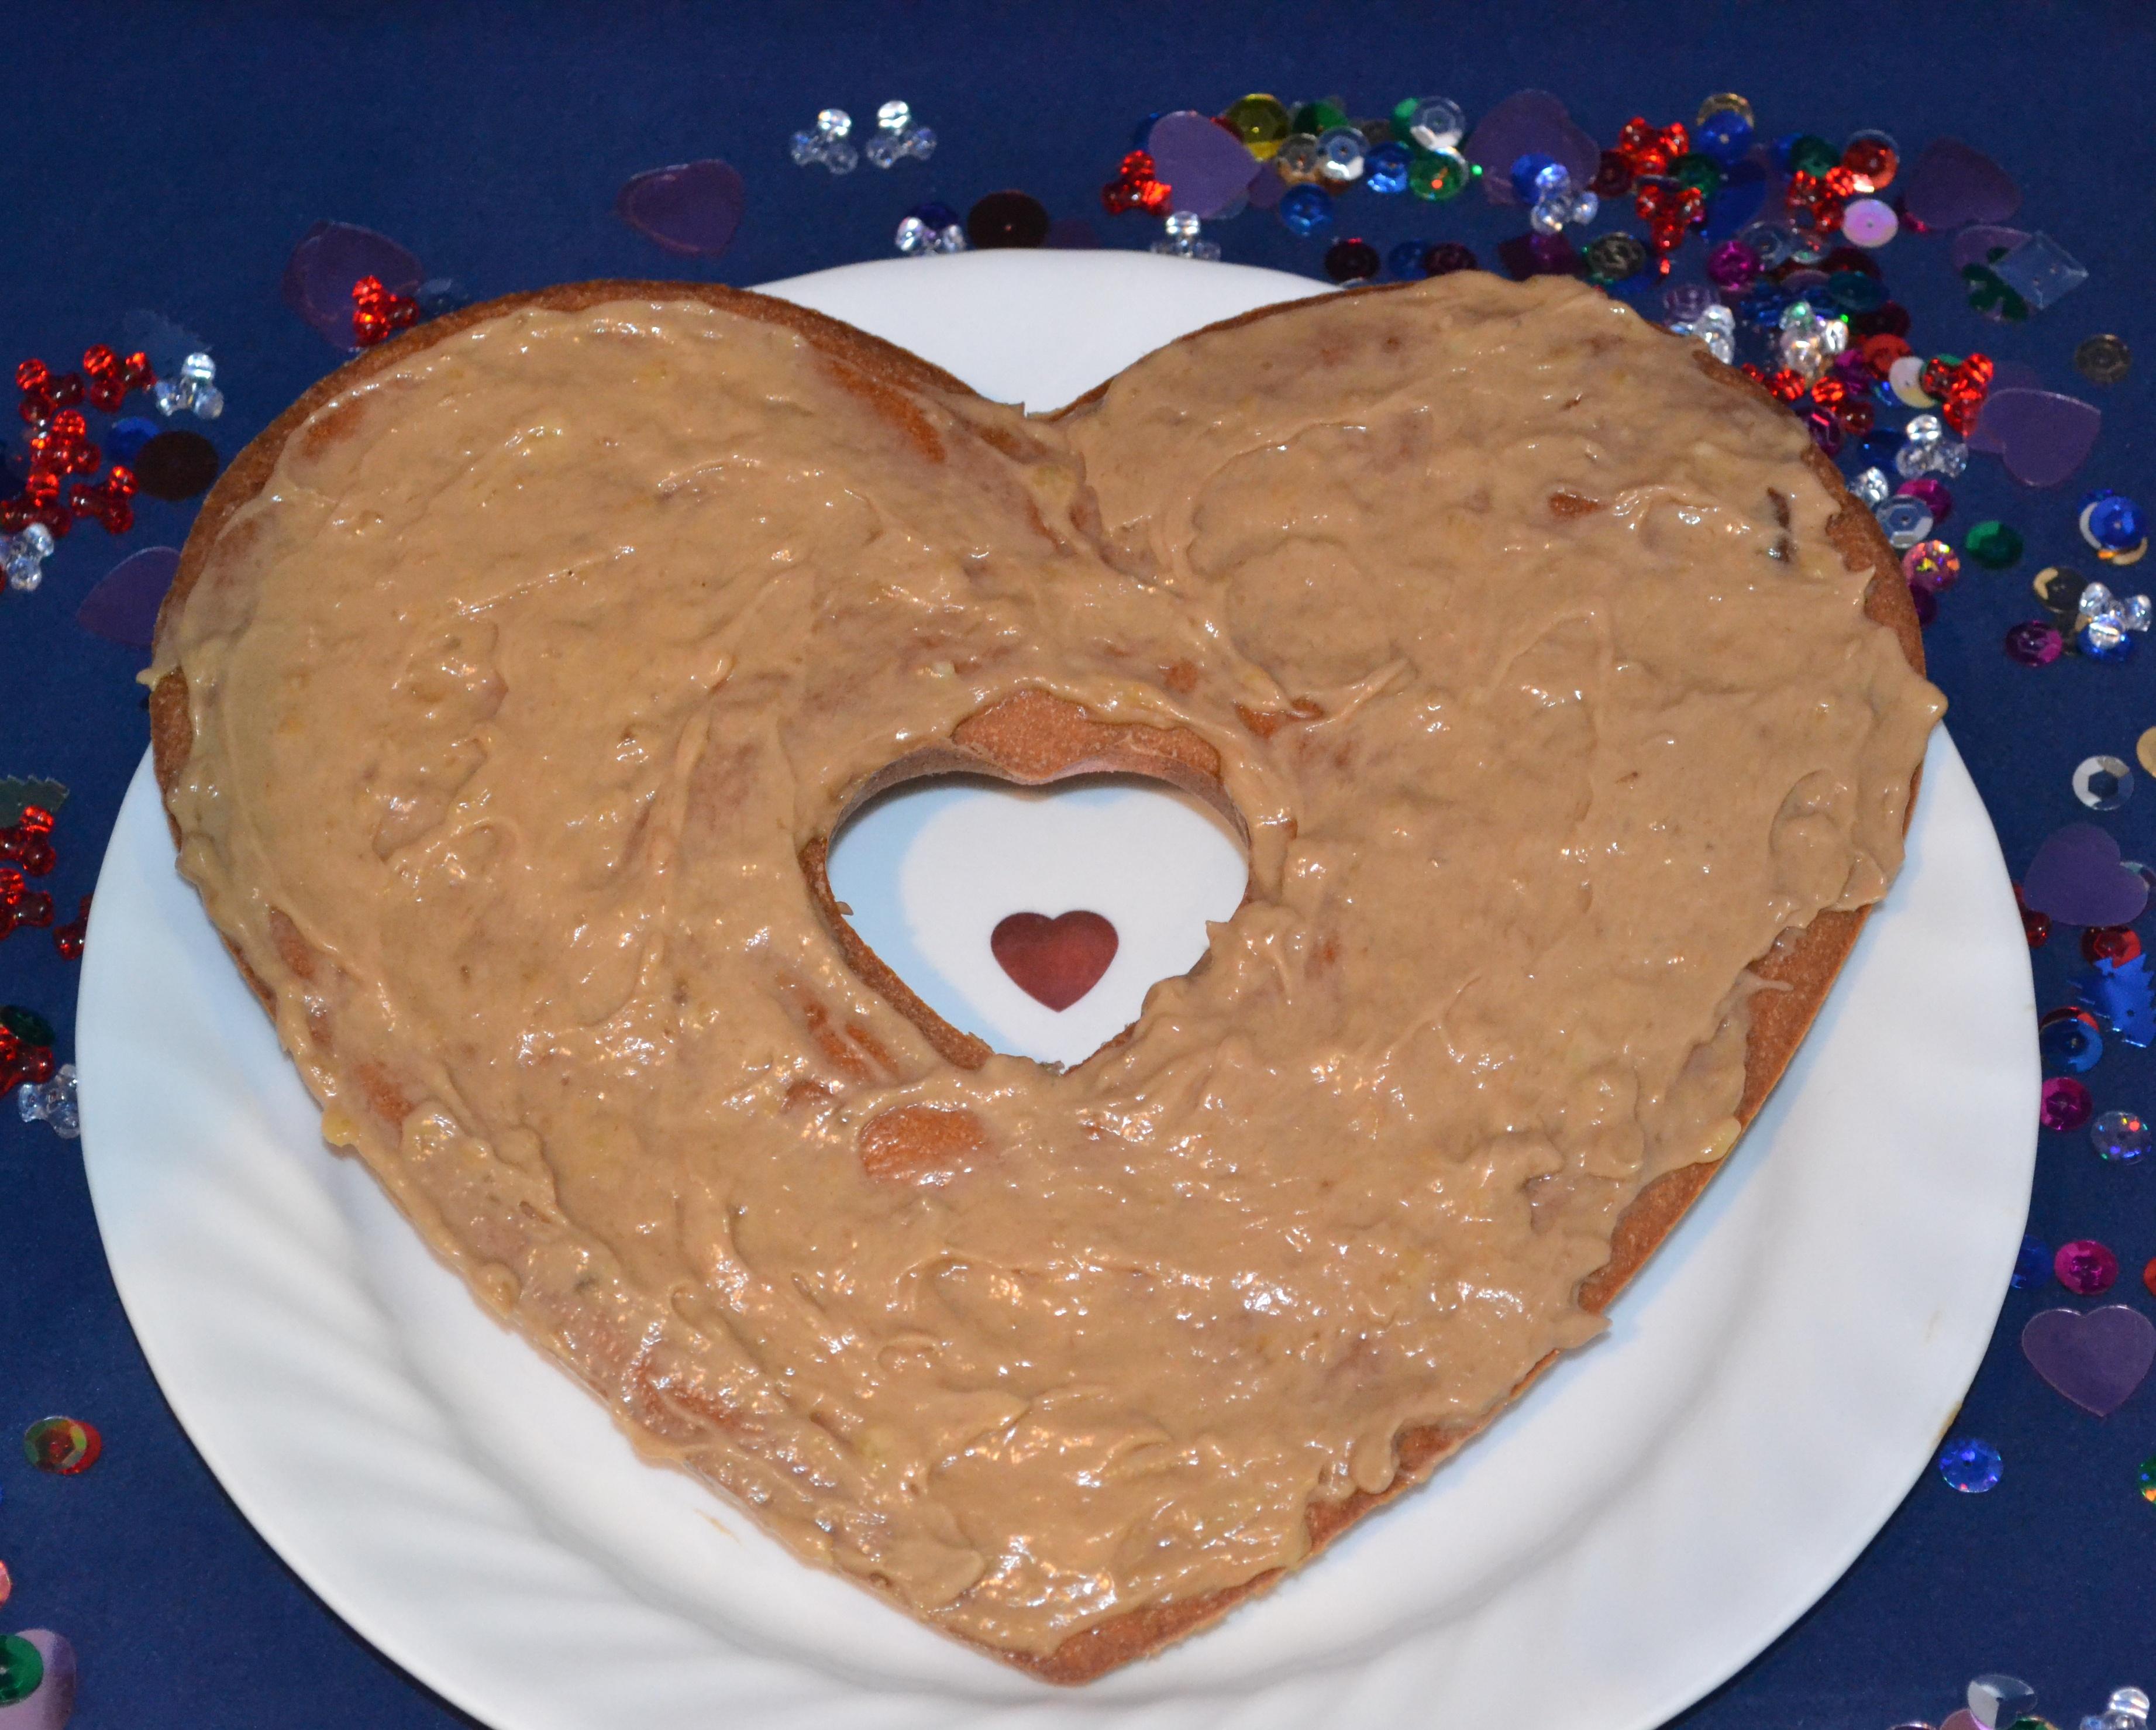 Heart cake dog treat